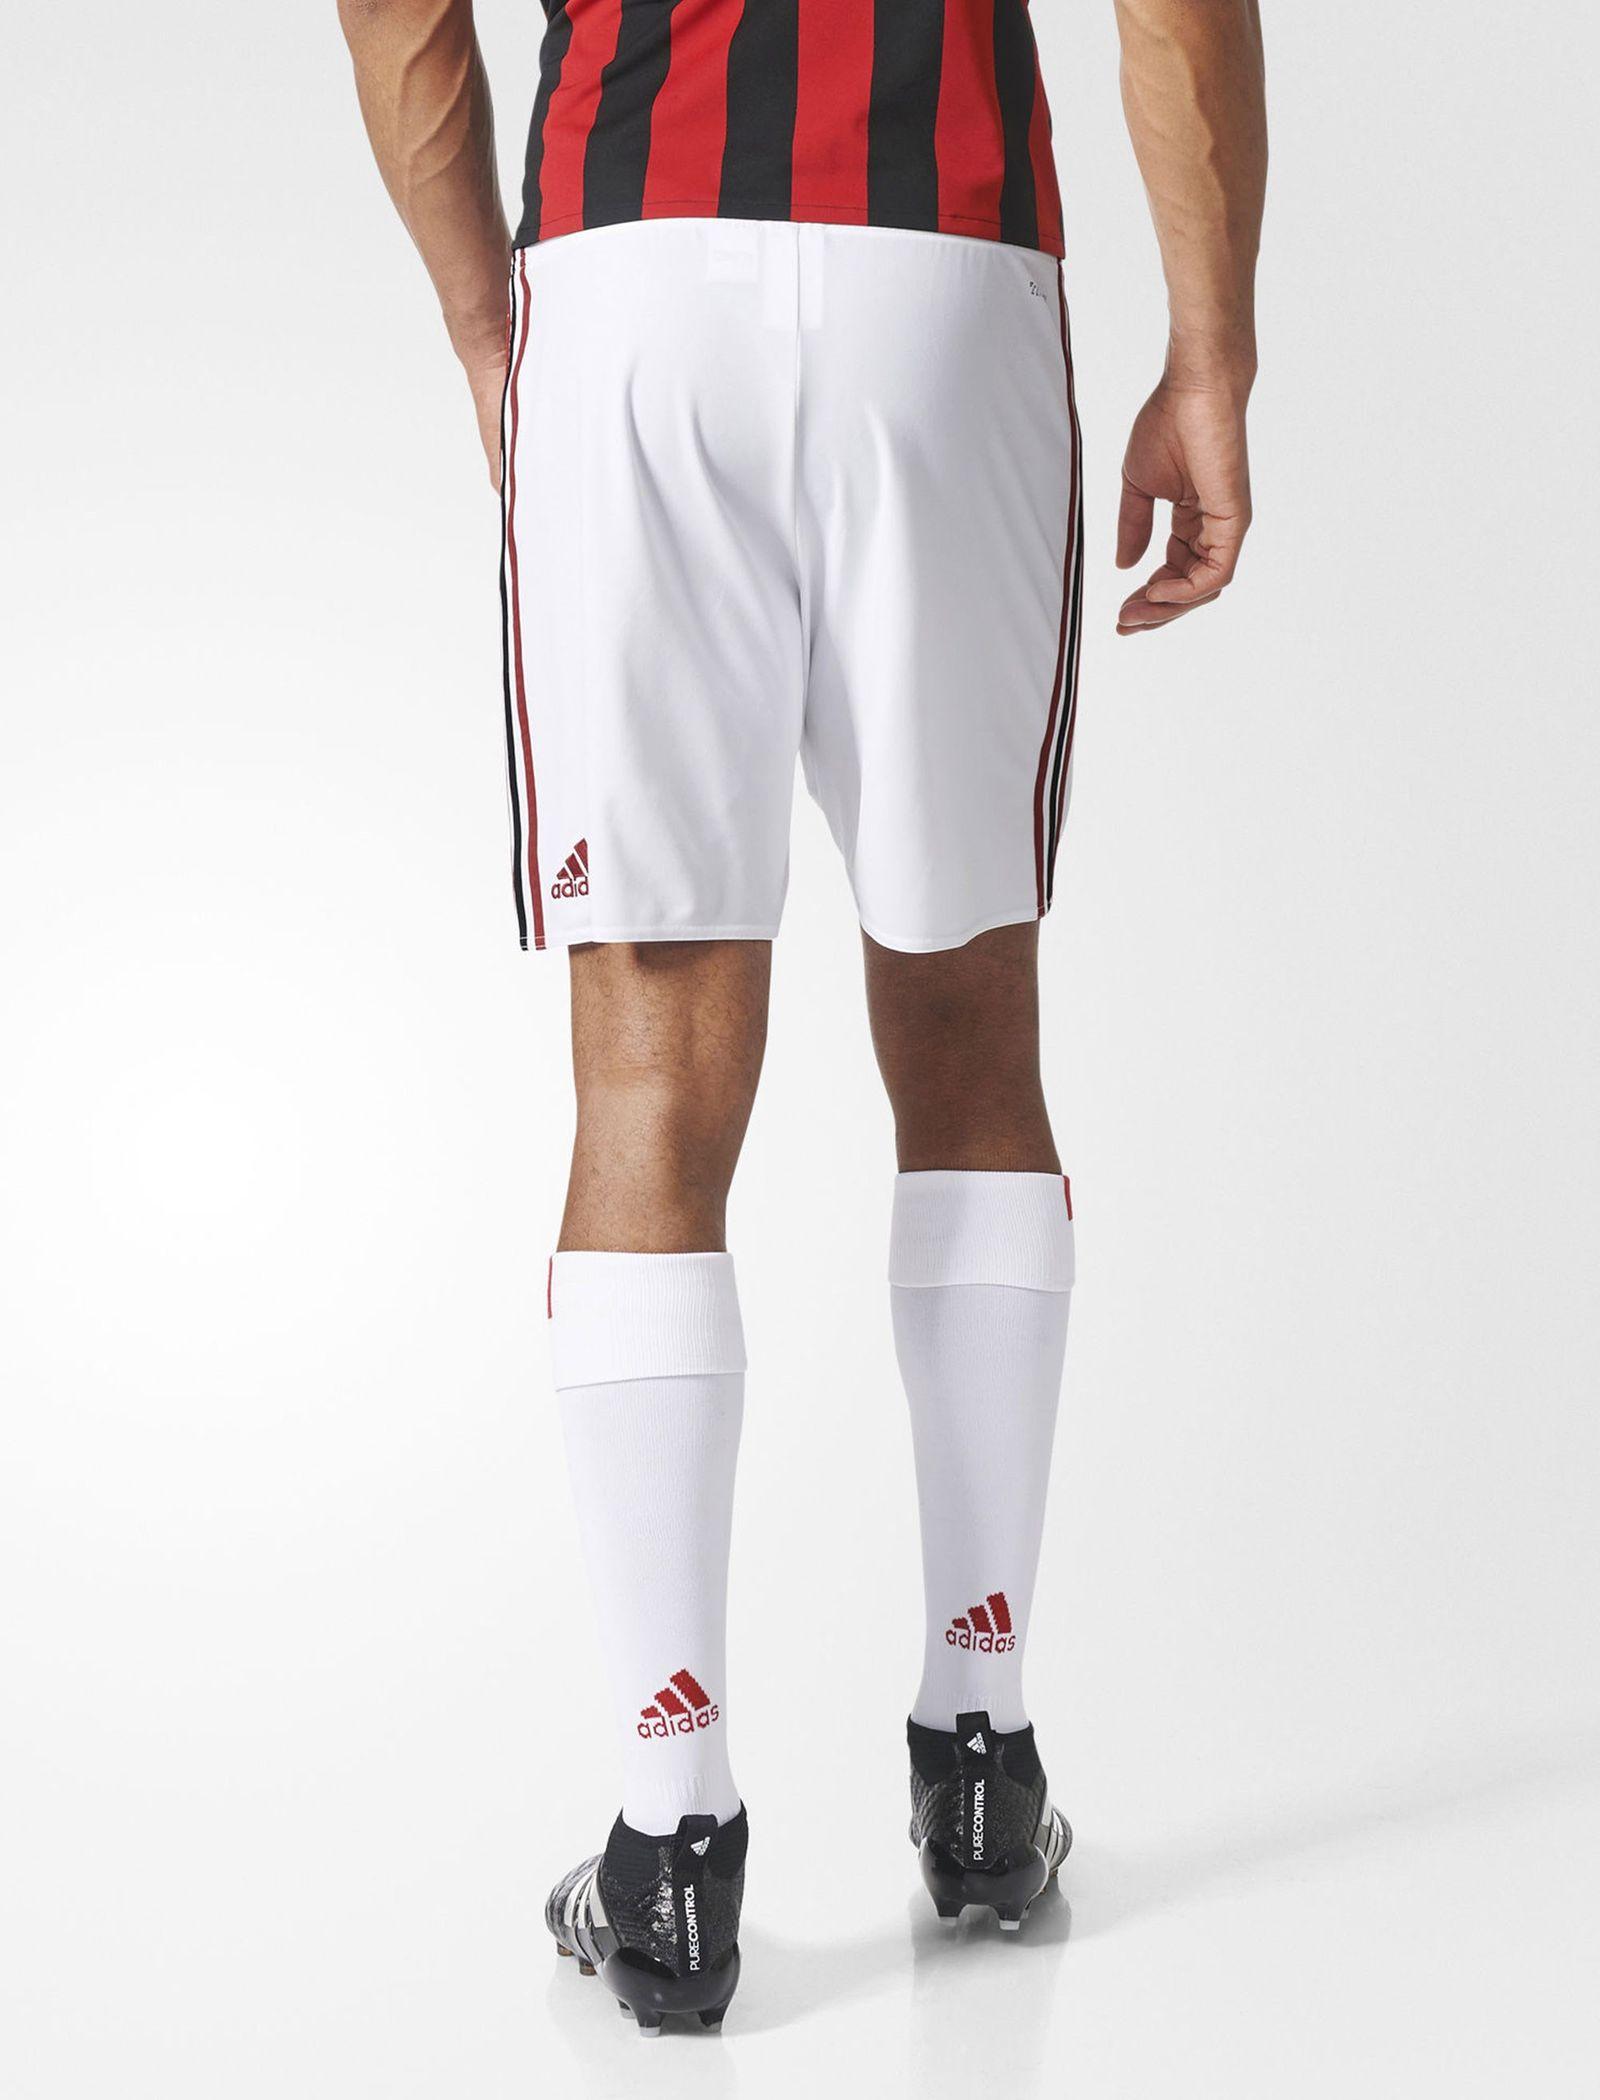 شلوارک فوتبال تیم  AC Milan Replica - آدیداس - سفيد   - 5